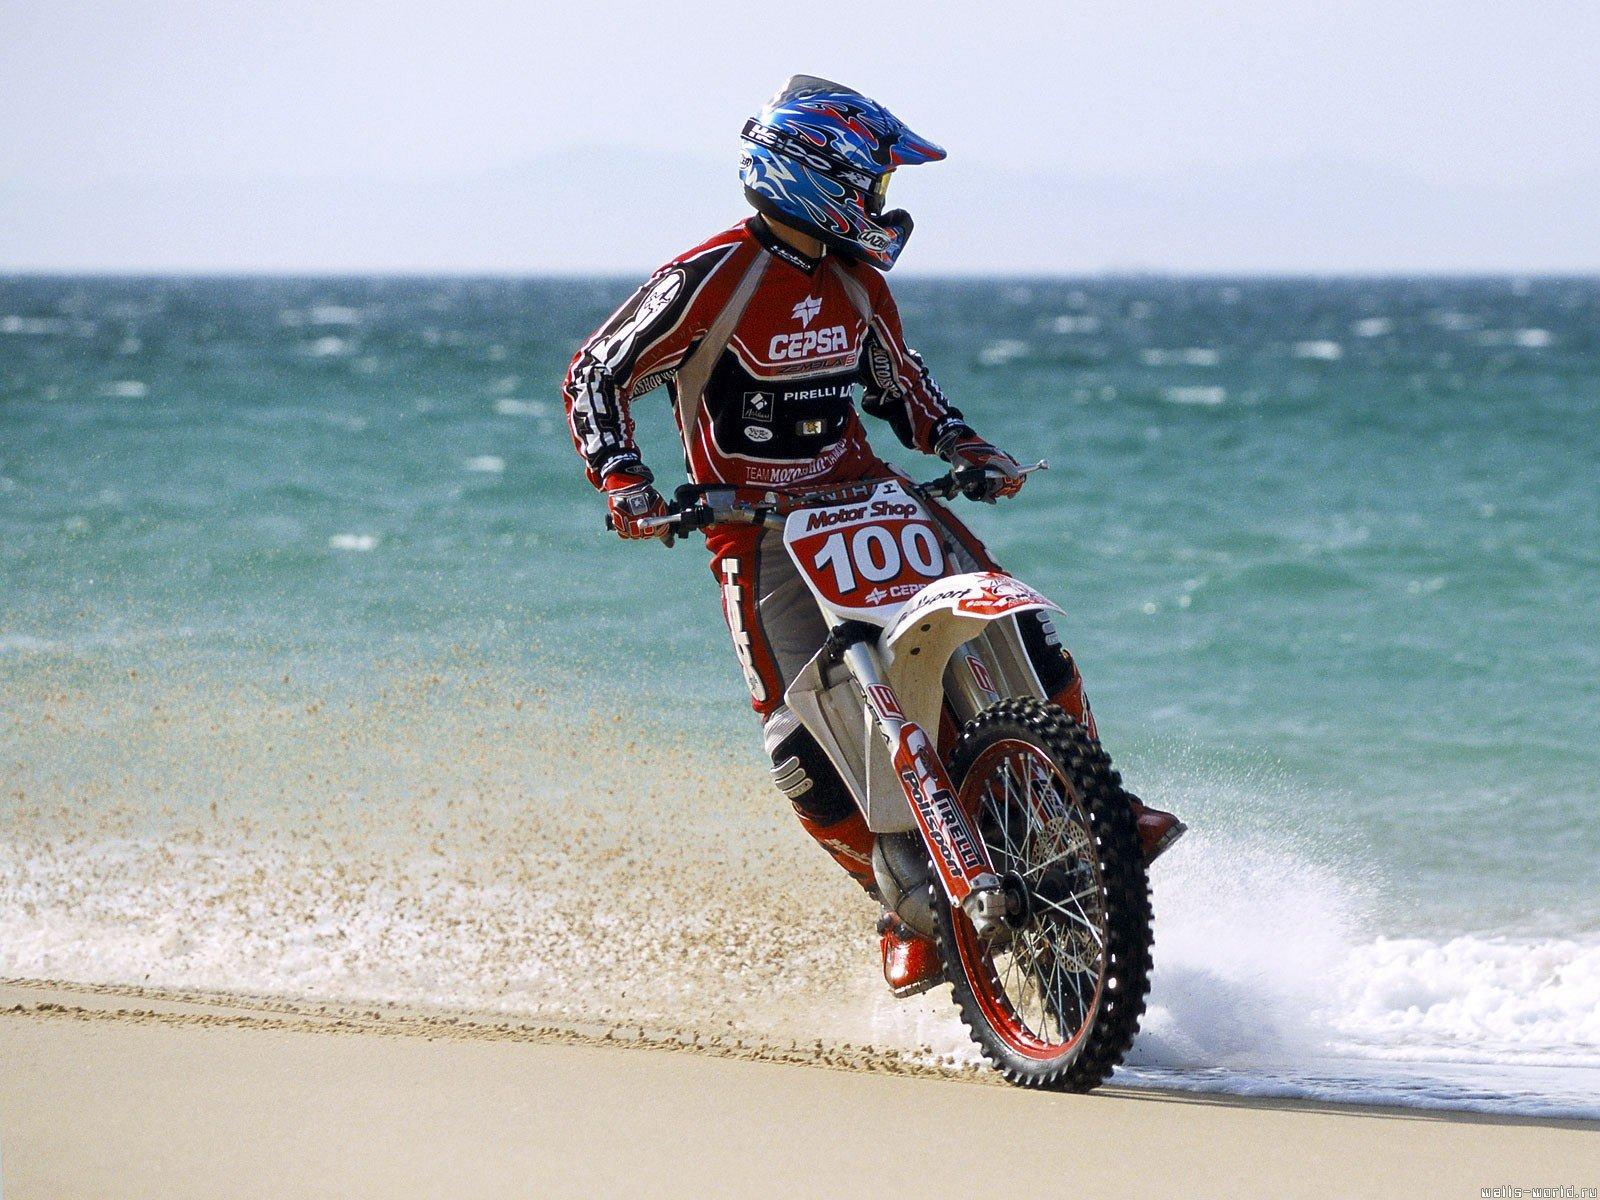 Motocross (Dirt Bike) wallpapers HD for desktop backgrounds